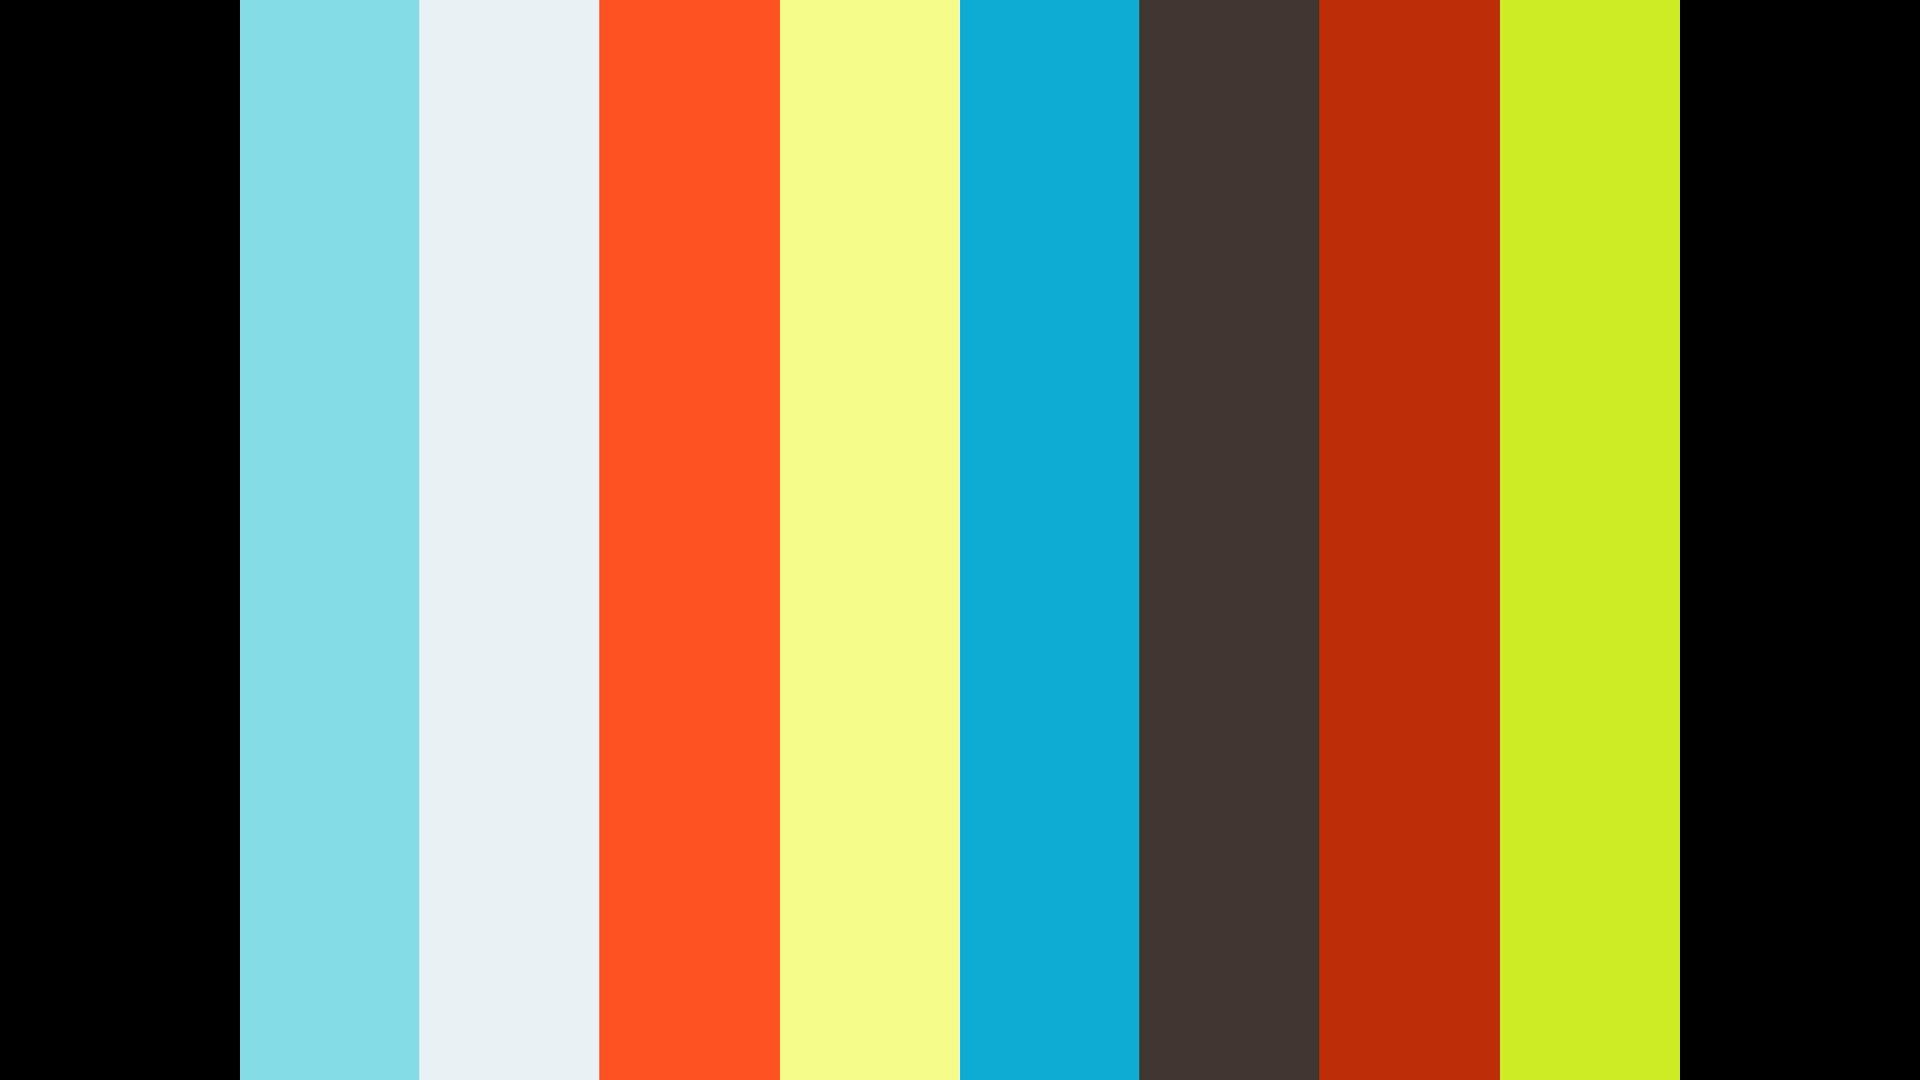 Dooinit Festival 2017 #1 - Prodigy of Mobb Deep